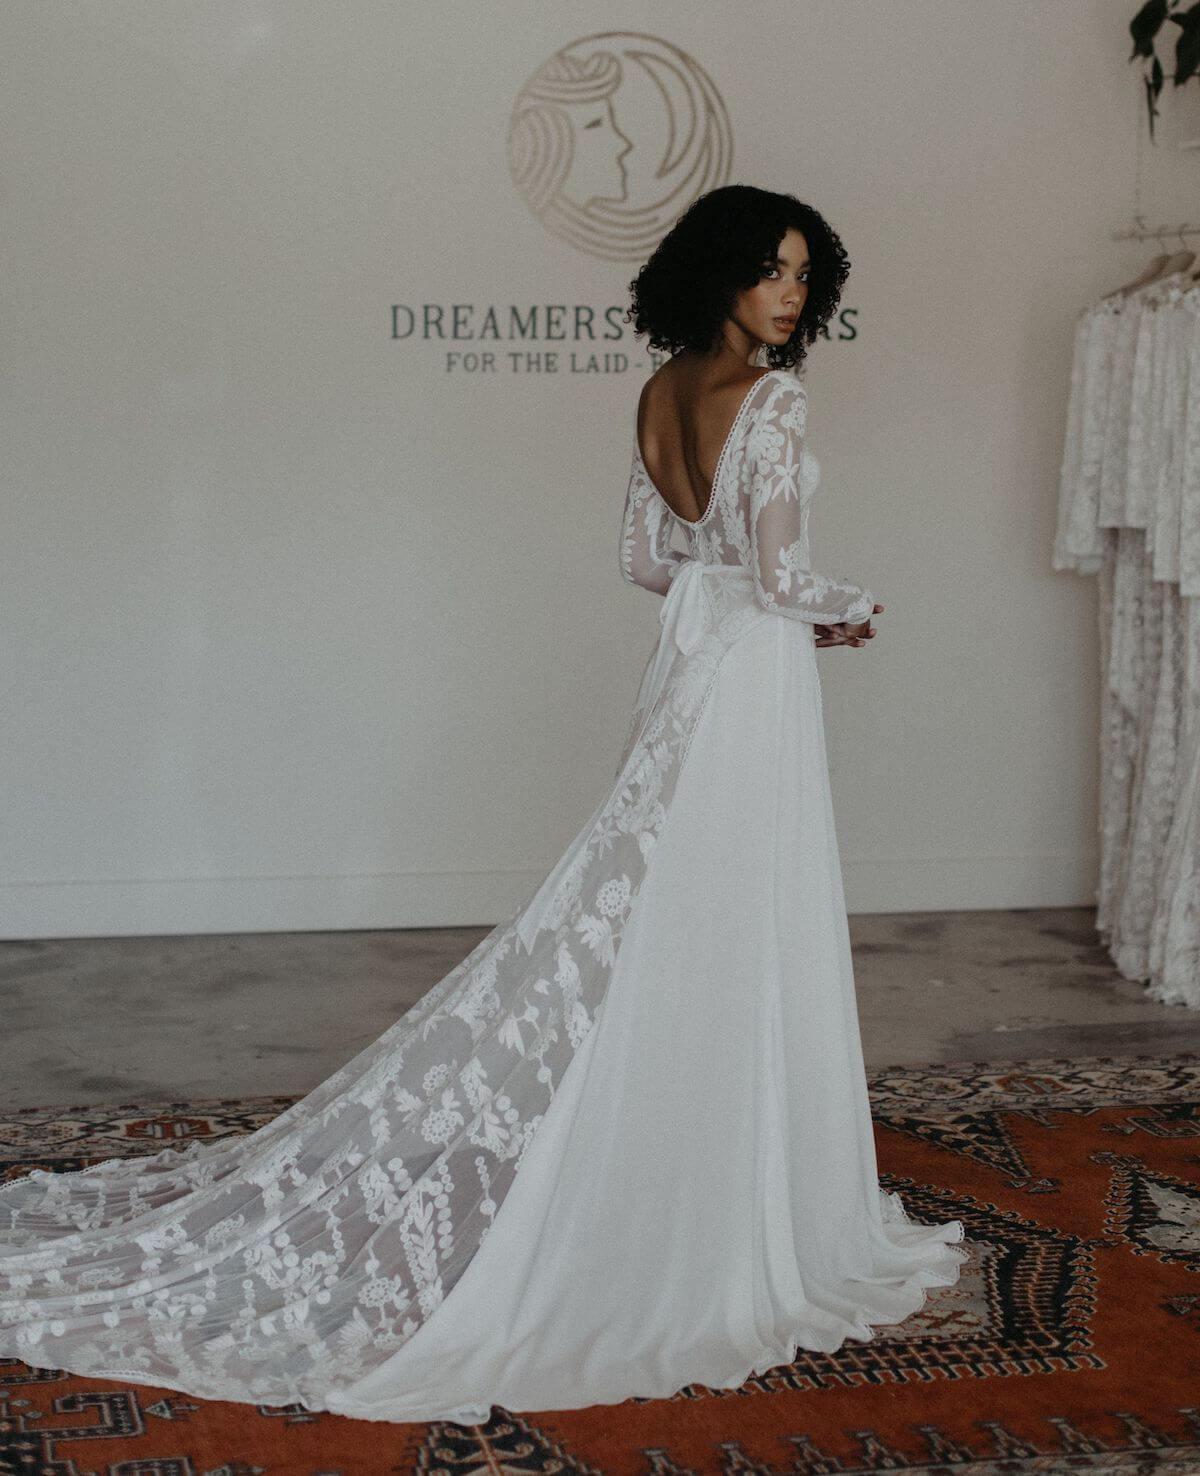 Savannah Rustic Lace Wedding Dress